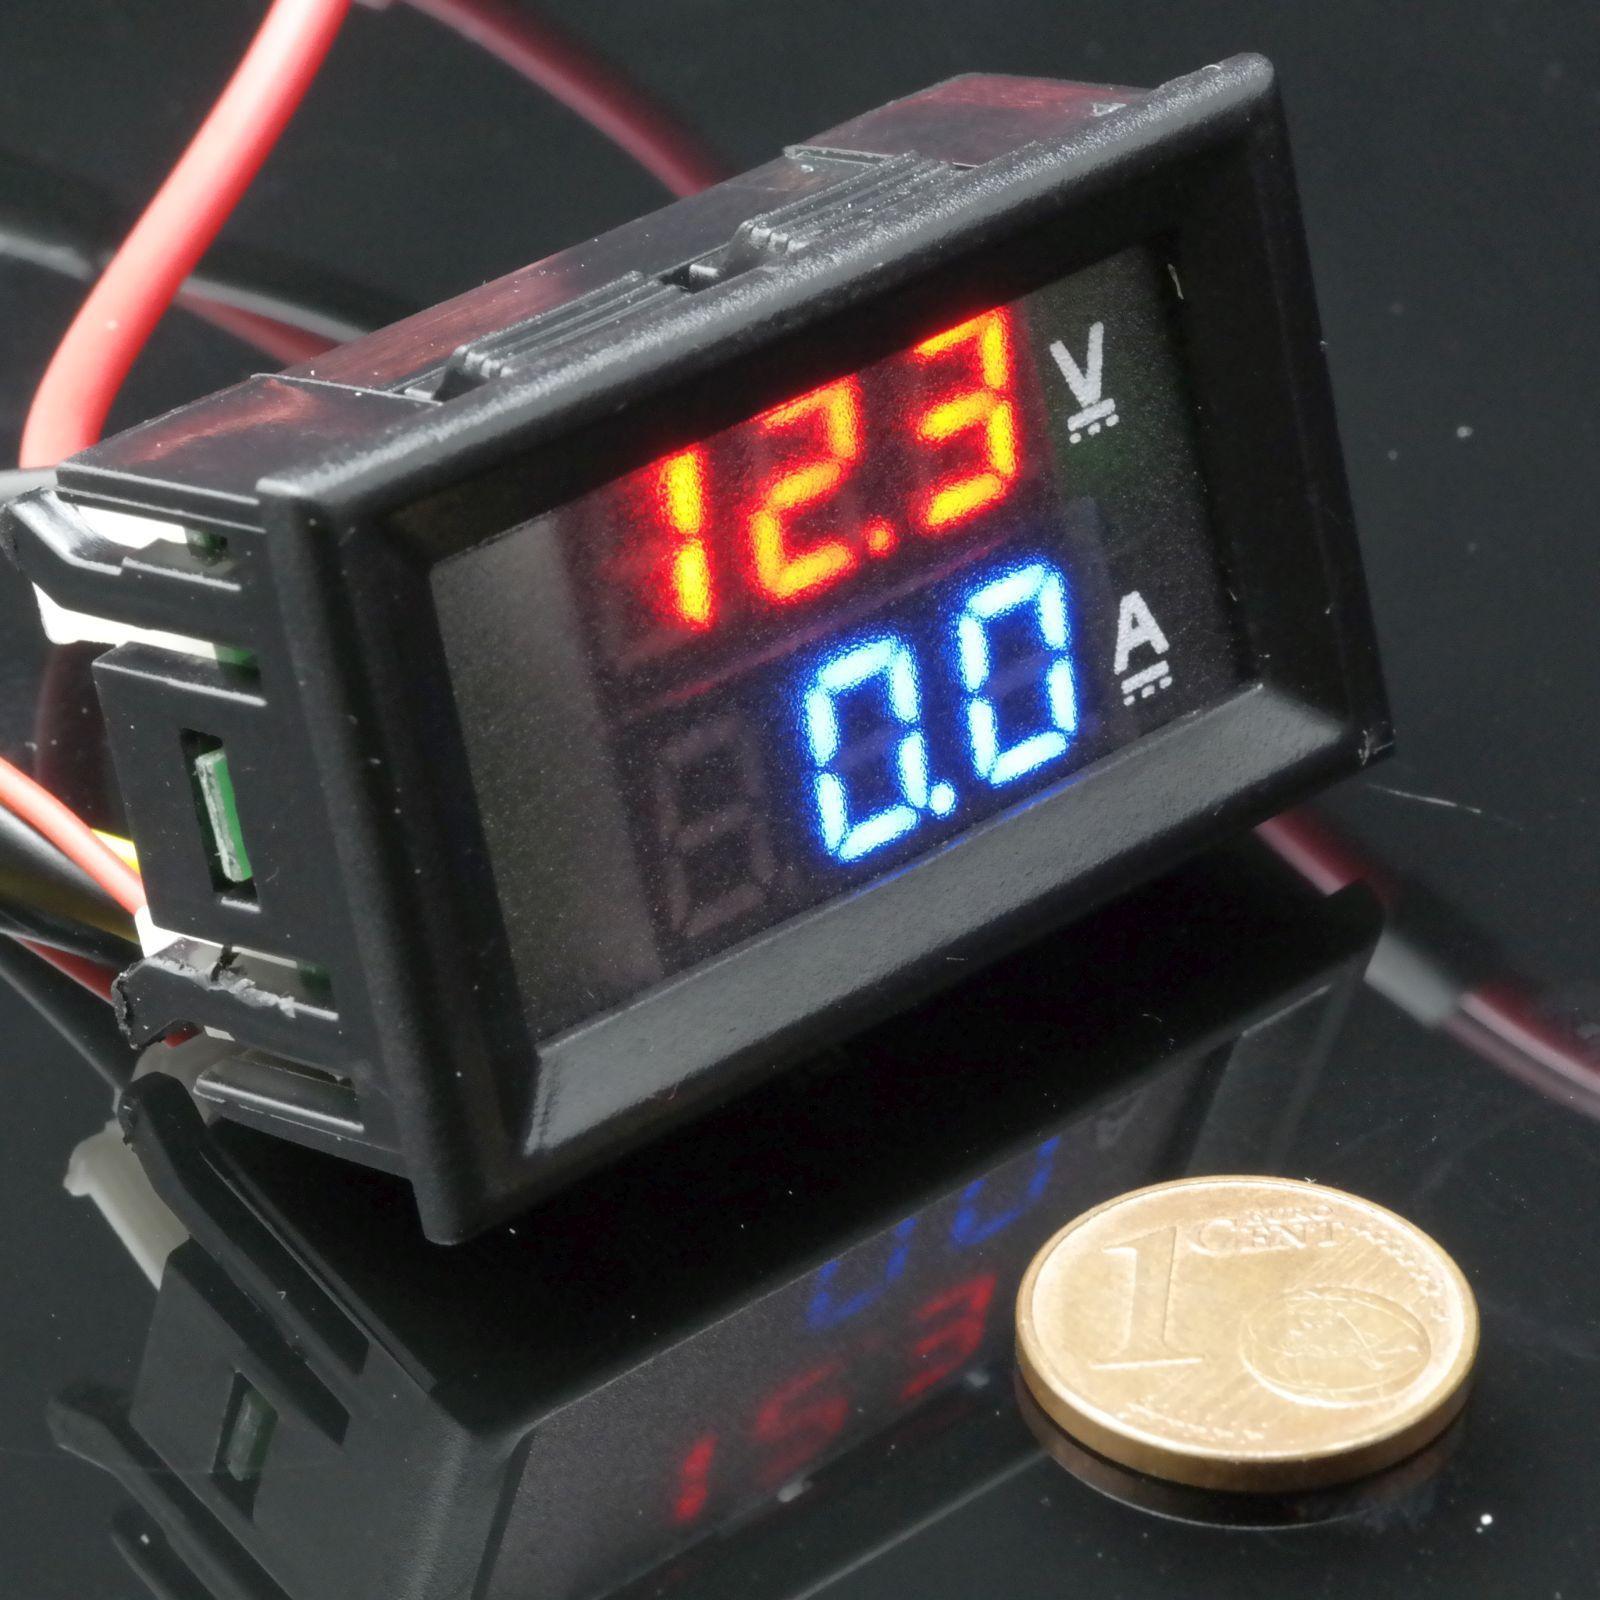 USB Charger Doctor Volt /& Amperemeter Monitor Spannung Strom Messgerät /& Zubehör